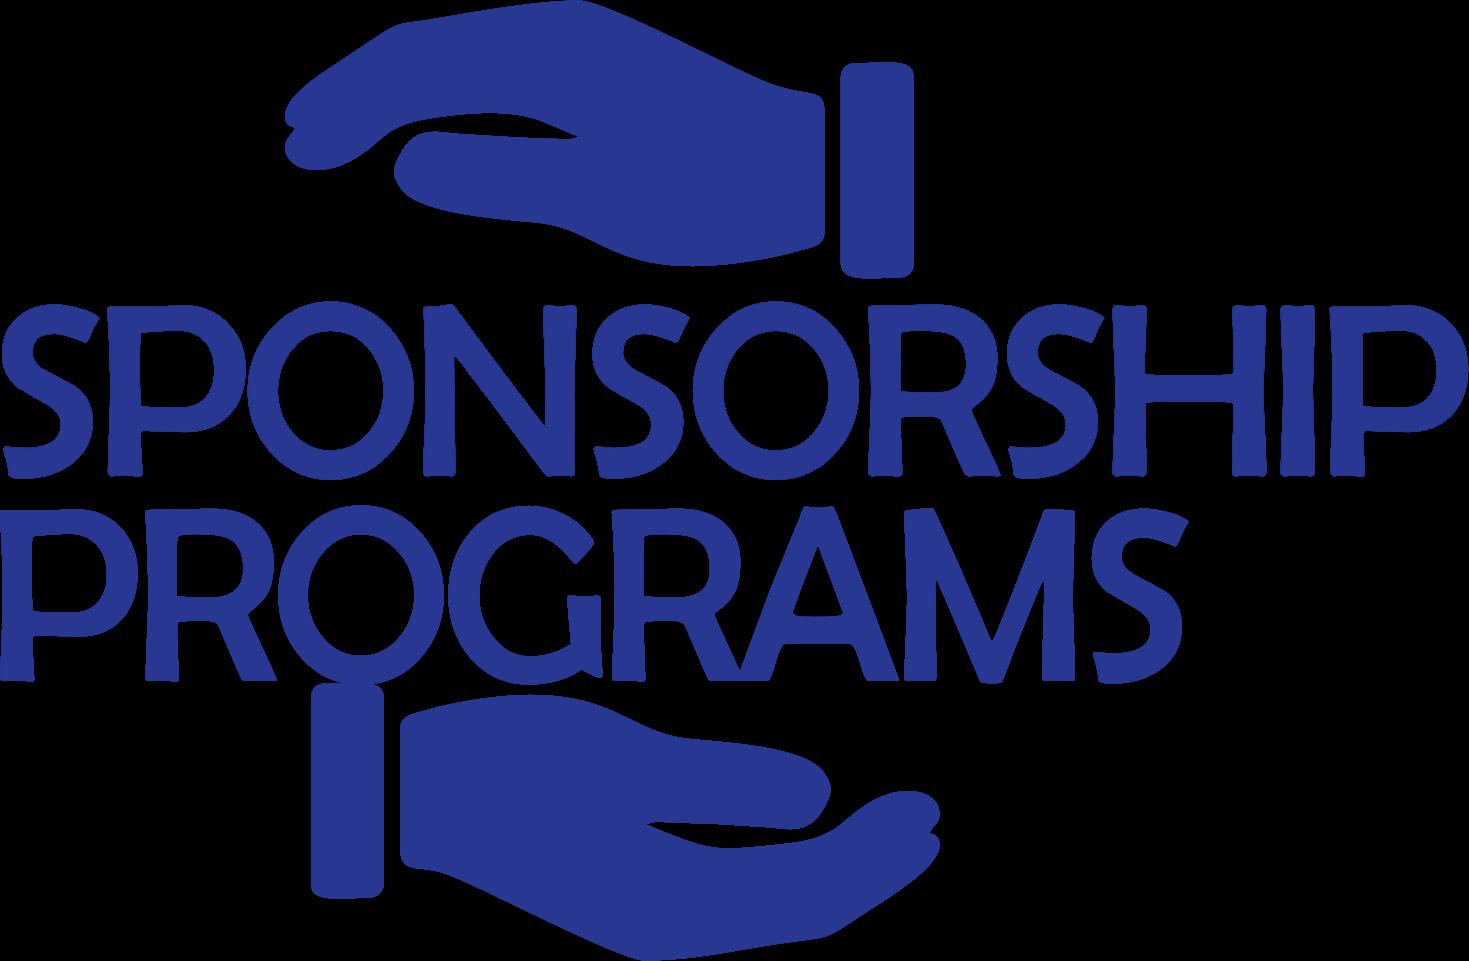 Sponsorship Programms